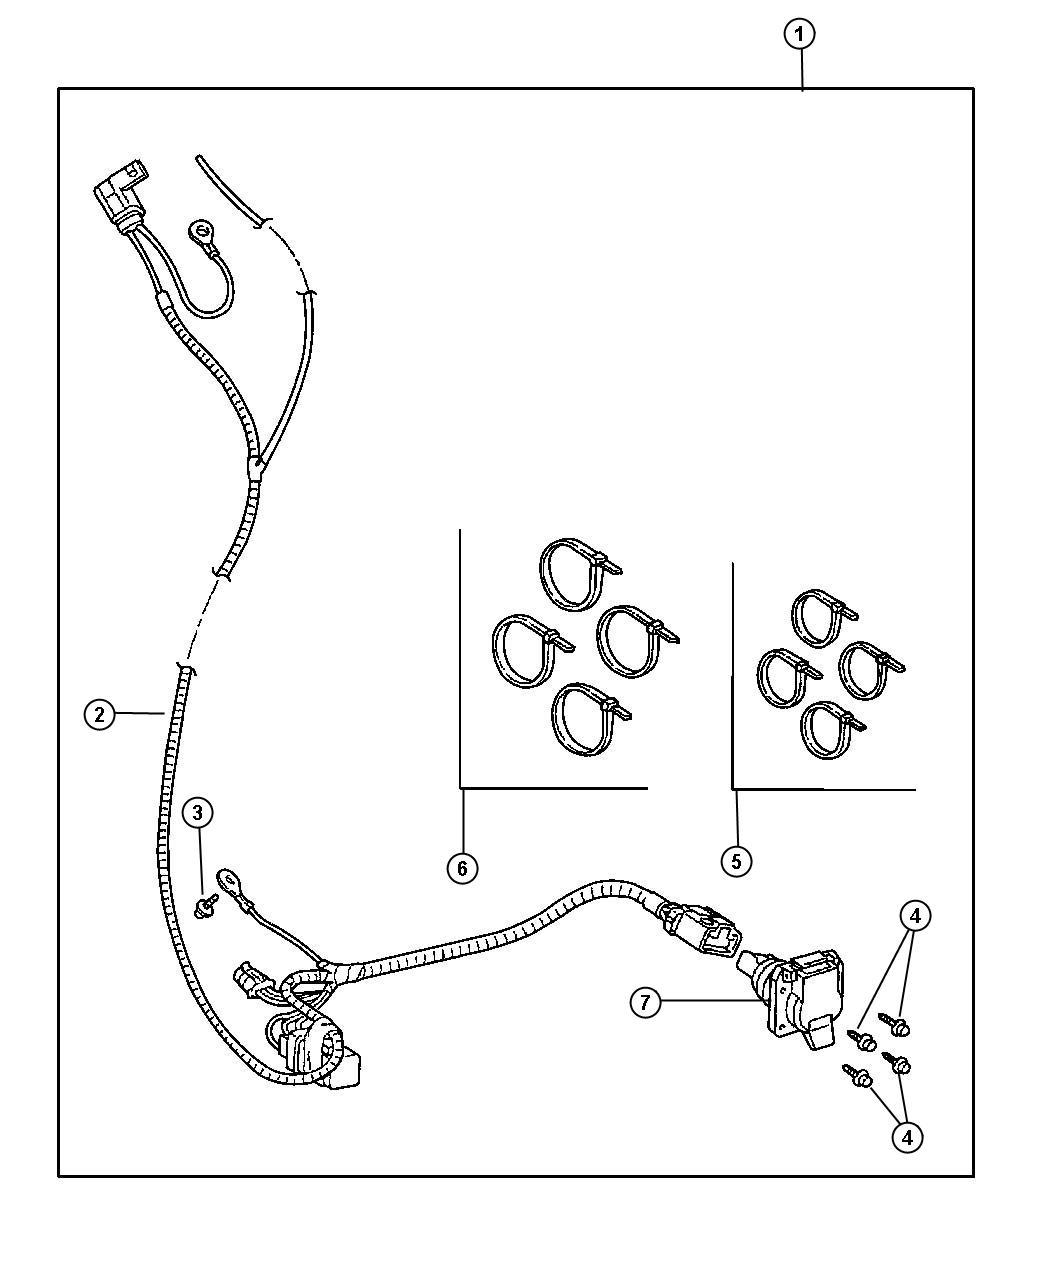 Chrysler Cirrus LX Connector. 7 way. Ahc, pollak, sseries